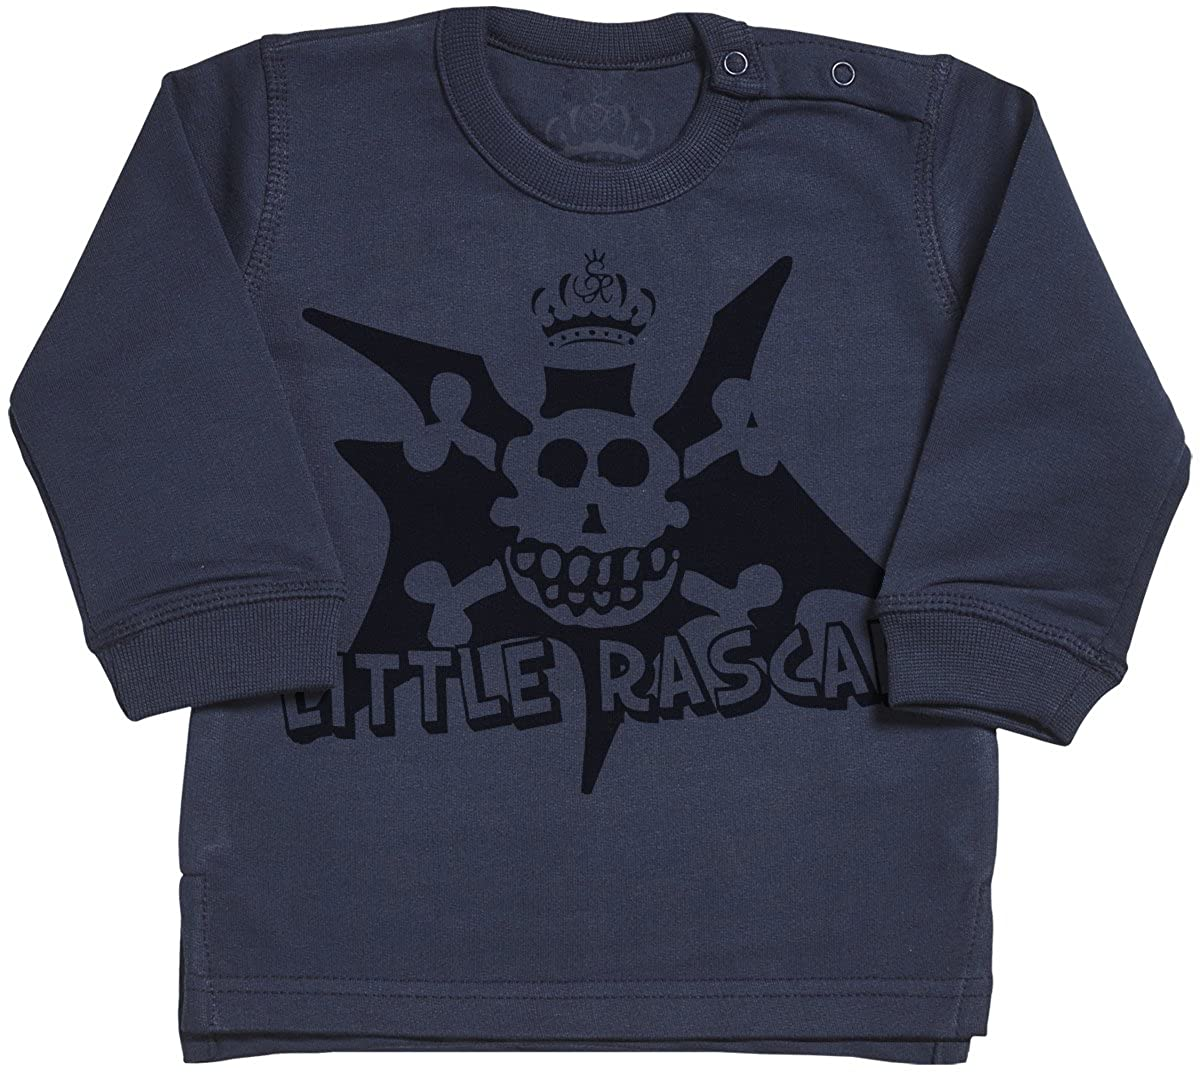 Baby Jumper Baby Girl Sweater Baby Sweatshirt Grey Baby Boy Sweater SR Little Rascal Baby Sweater